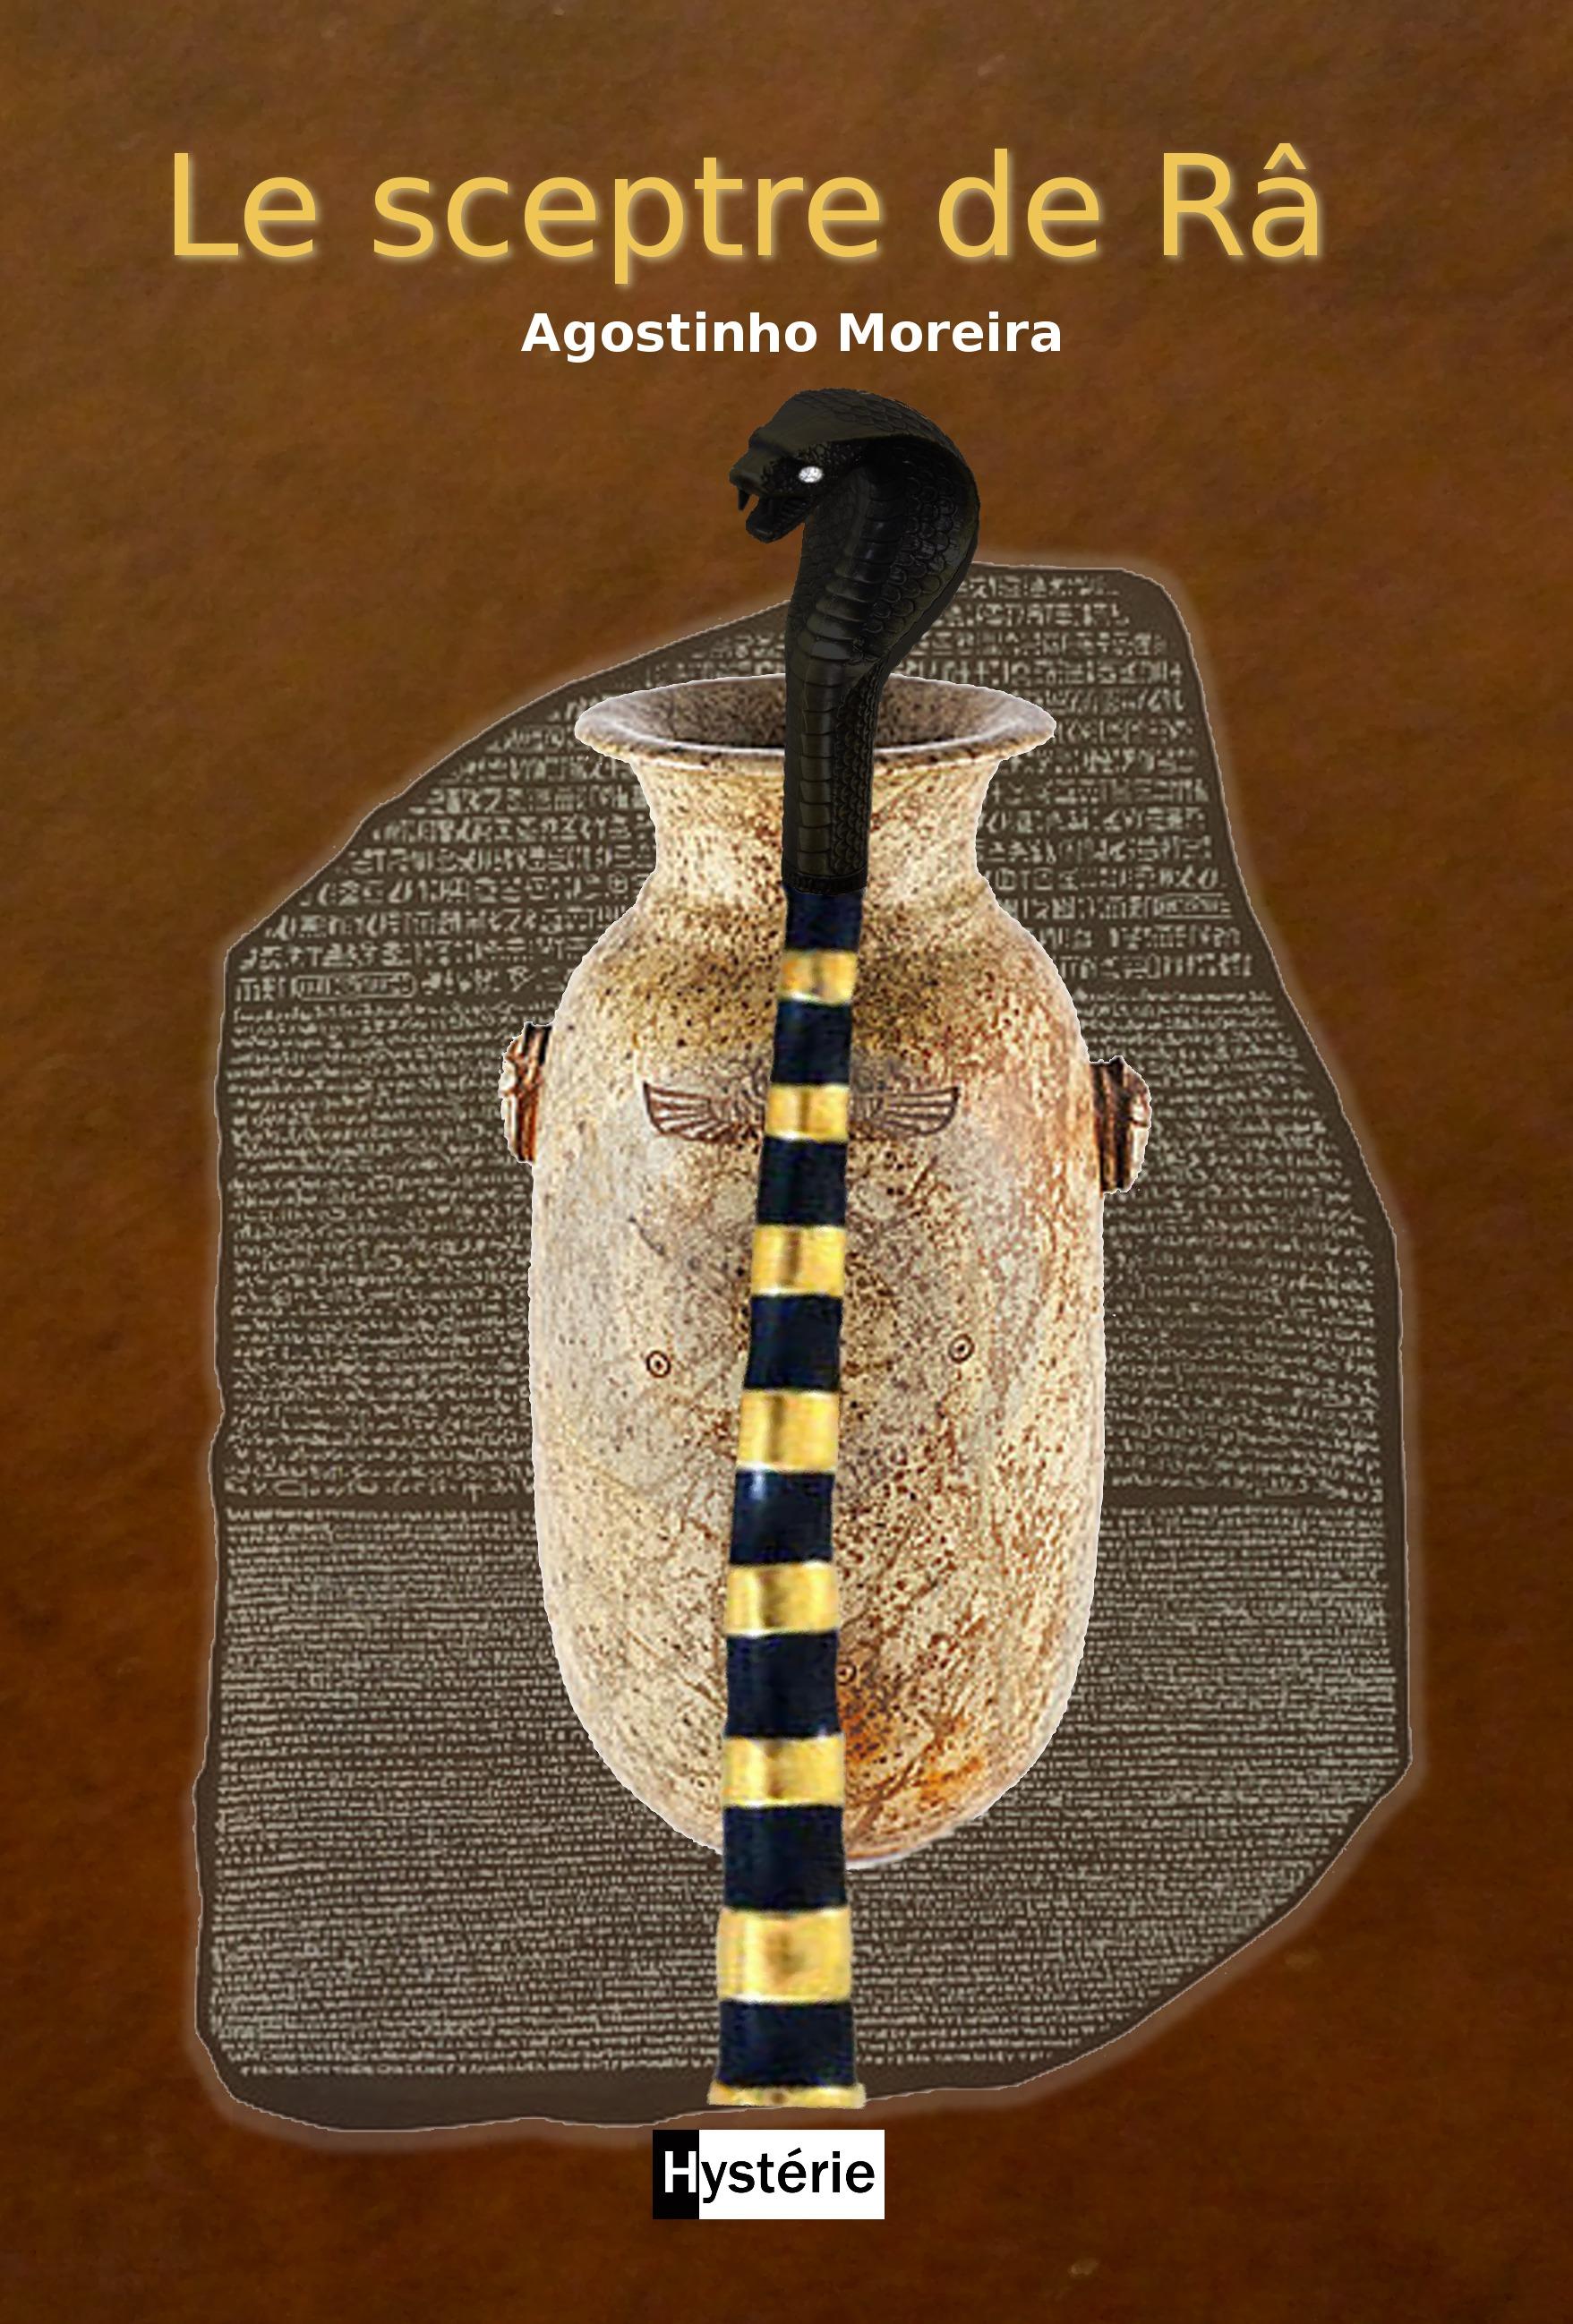 Le sceptre de Ra